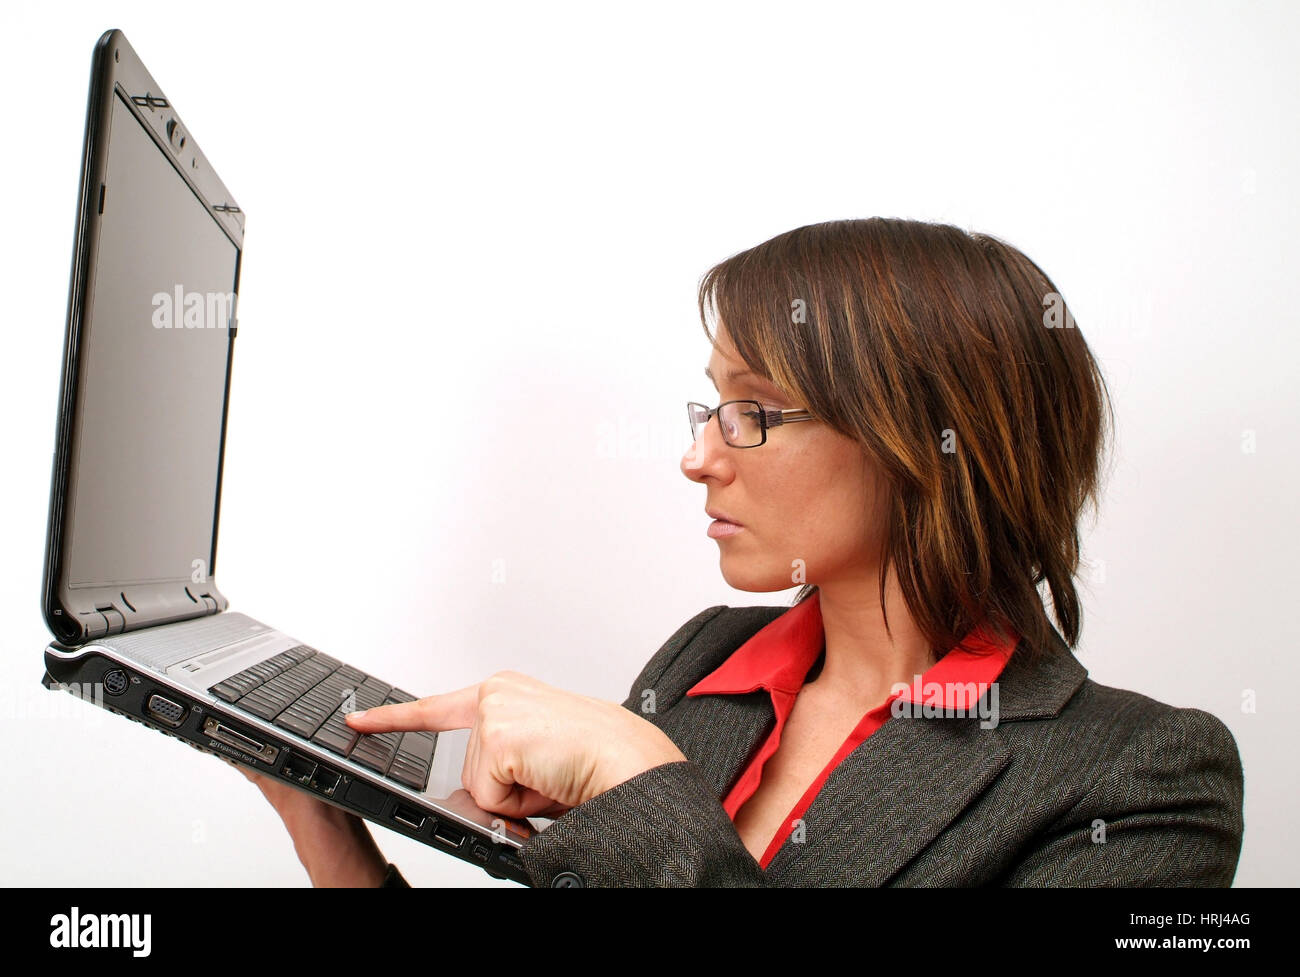 Junge Gesch?ftsfrau arbeitet am Notebook - young business woman using laptop Stock Photo